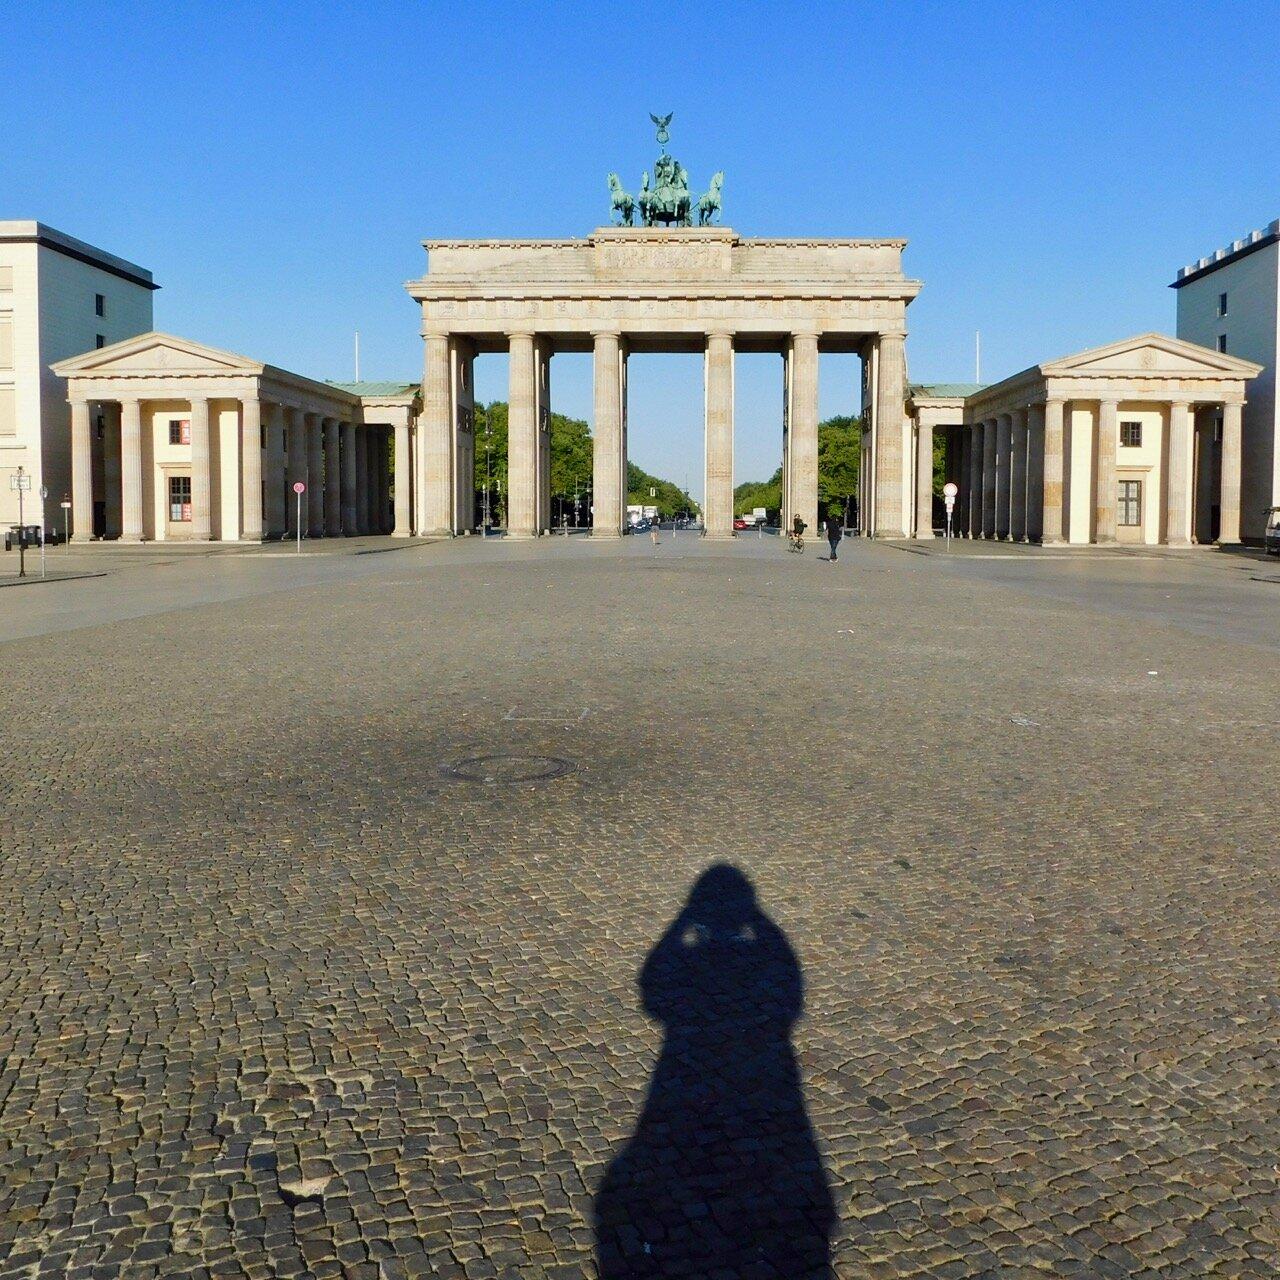 Volume 11: Hope from Berlin, #GoodReads & #GoodListens, & 35+ New Opportunities! - August 2018